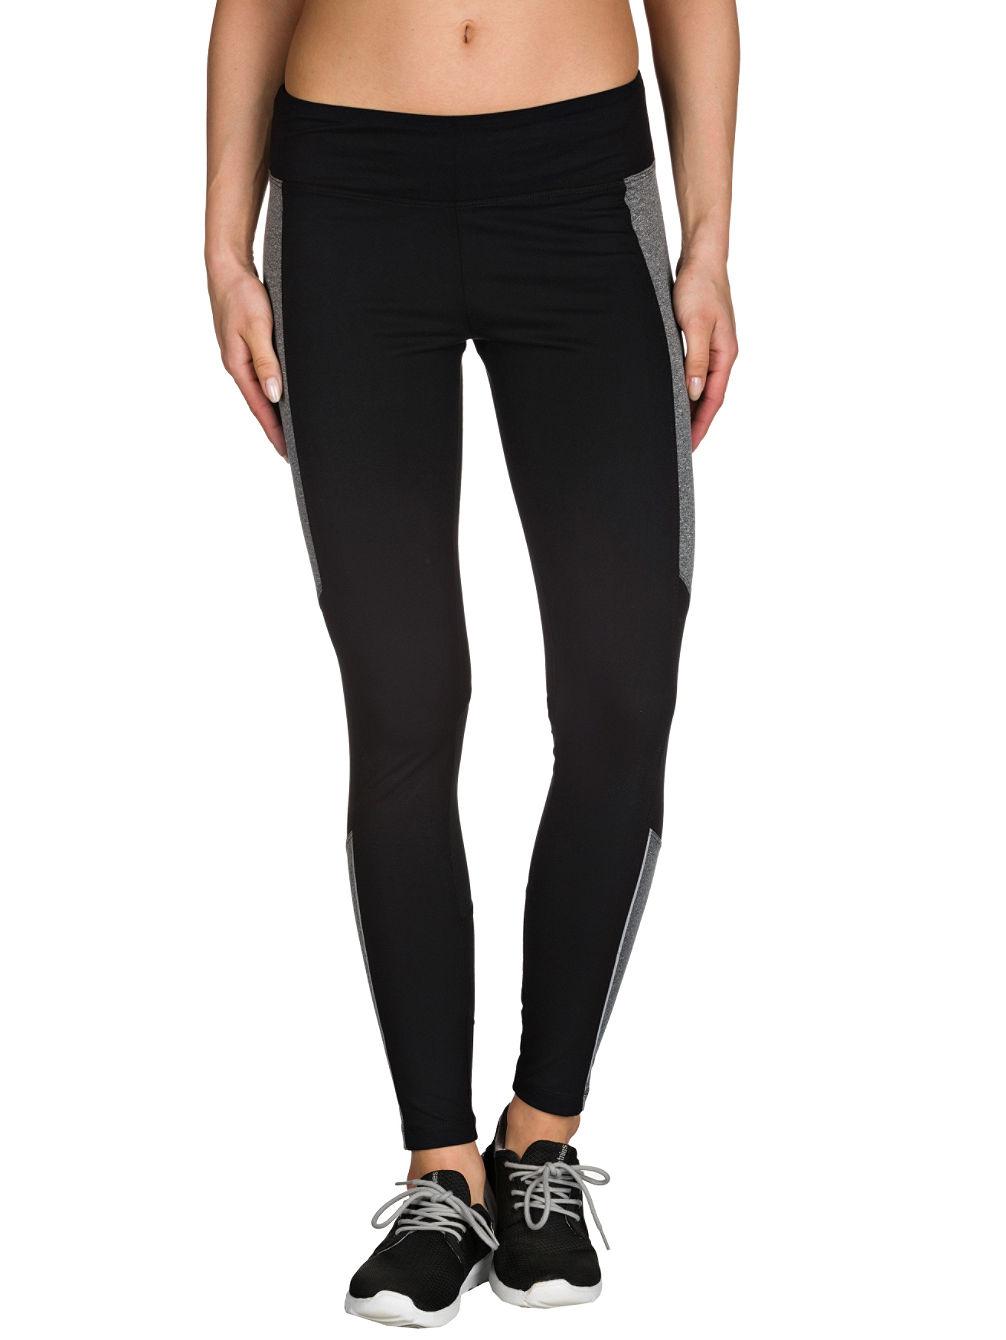 27a9faba4db1d7 Buy Marika Jordan Tight Tech Pants online at Blue Tomato